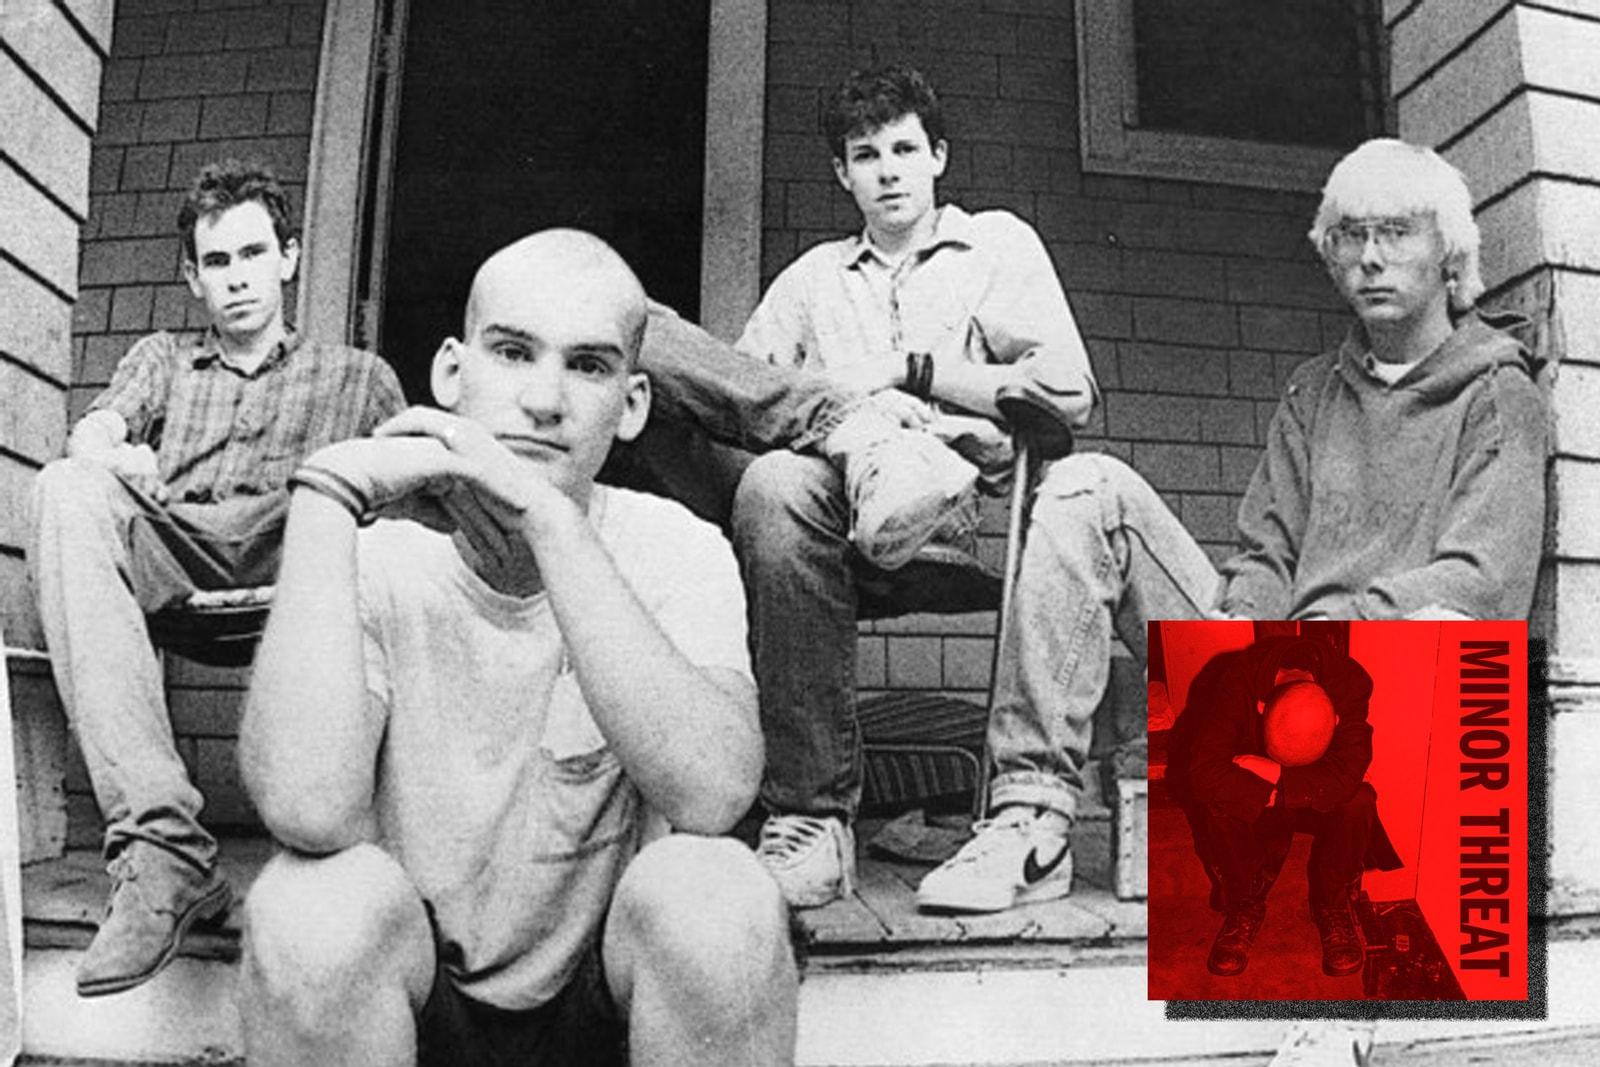 Best Hardcore Punk Albums bands bad brains black flag minor threat Descendents tsol misfits scream void Adolescents 45 grave